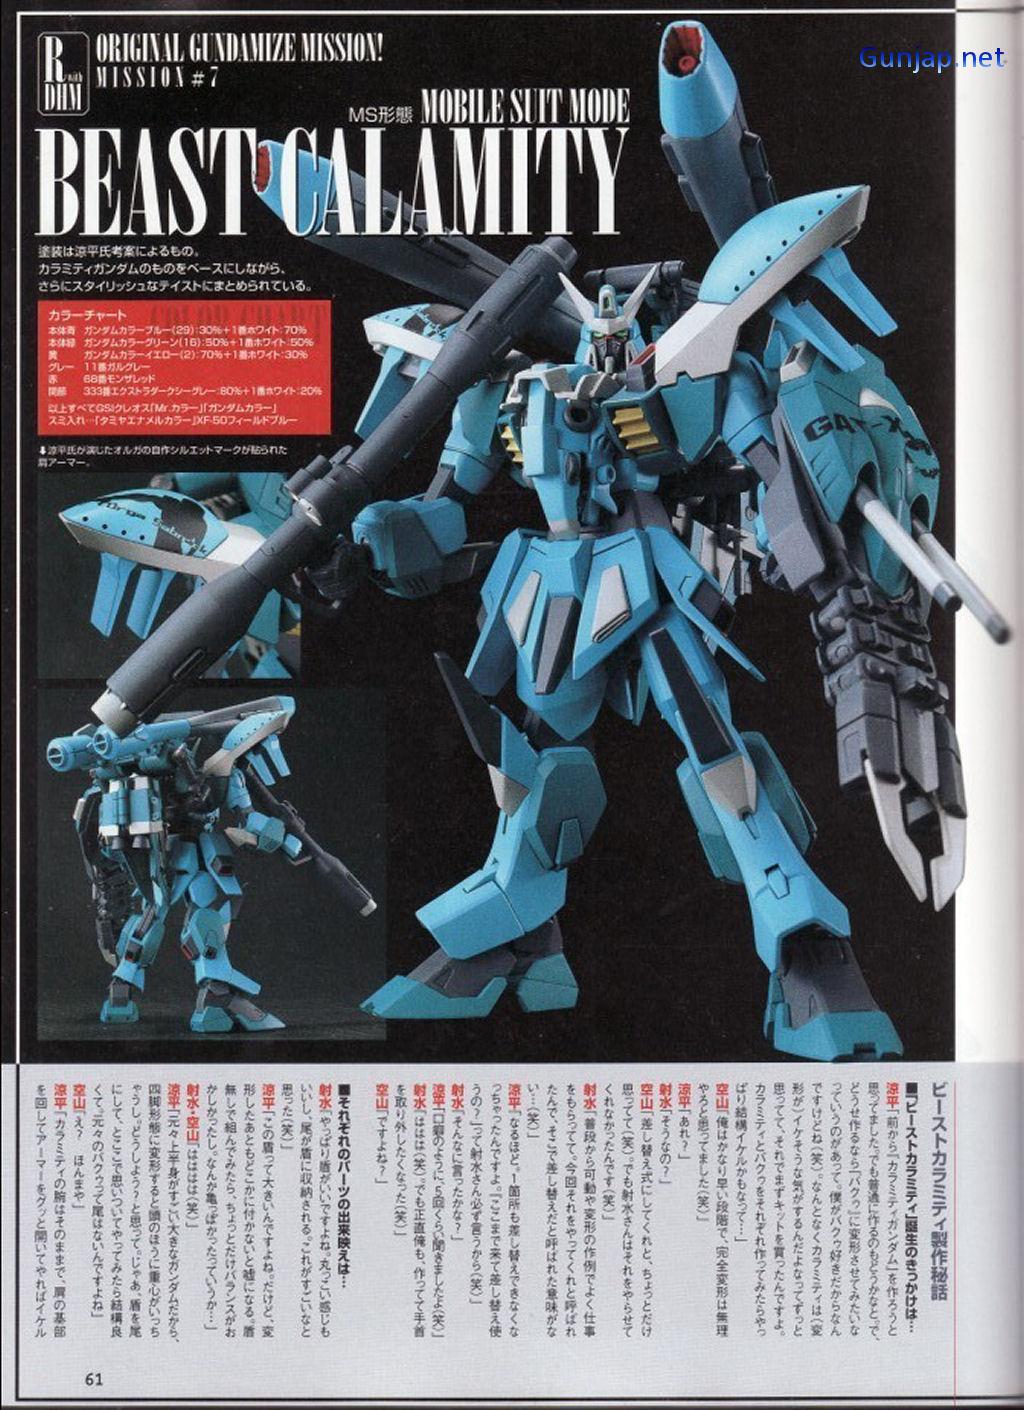 Gunpla Work: DHM-Seed-MSV BEAST CALAMITY (MS Mode & Beast ...